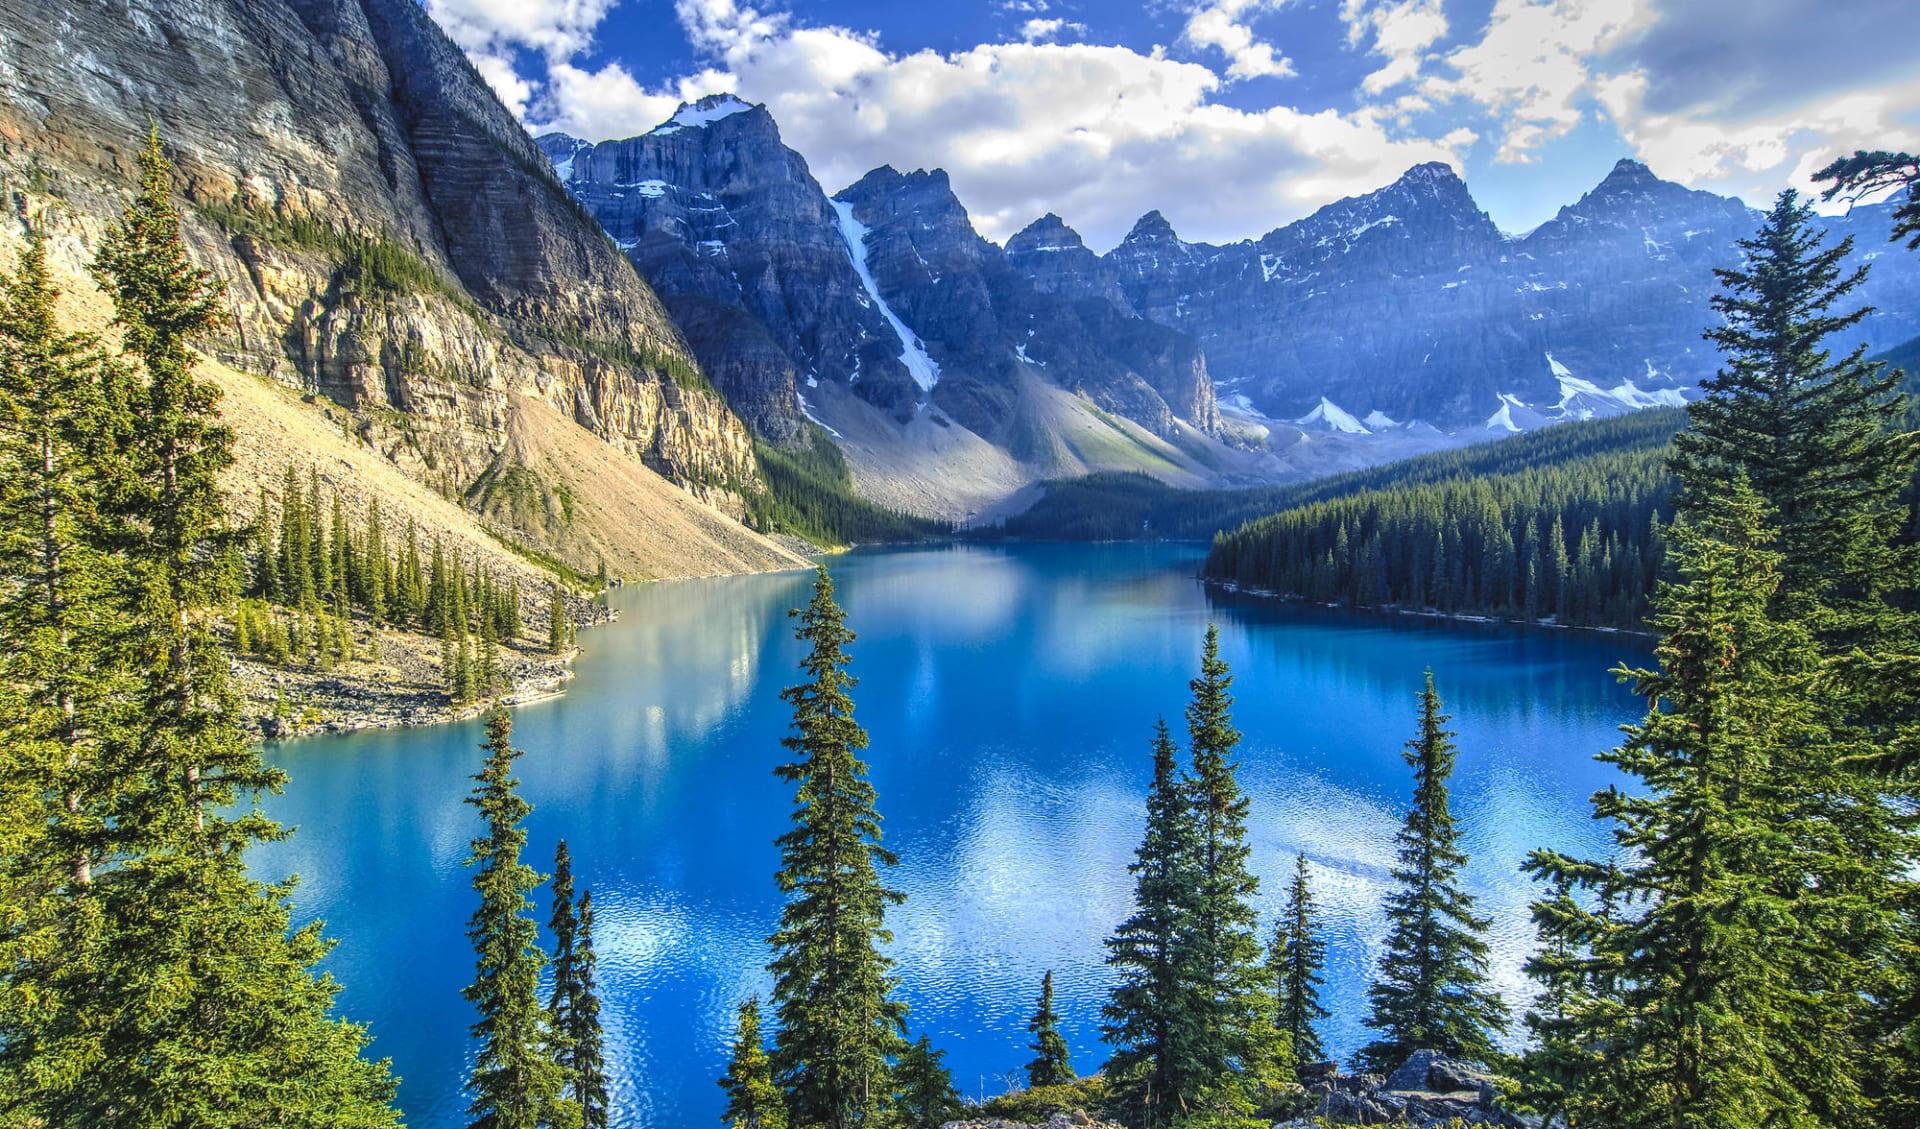 Wanderrundreise von Lodge zu Lodge ab Calgary: Moraine Lake